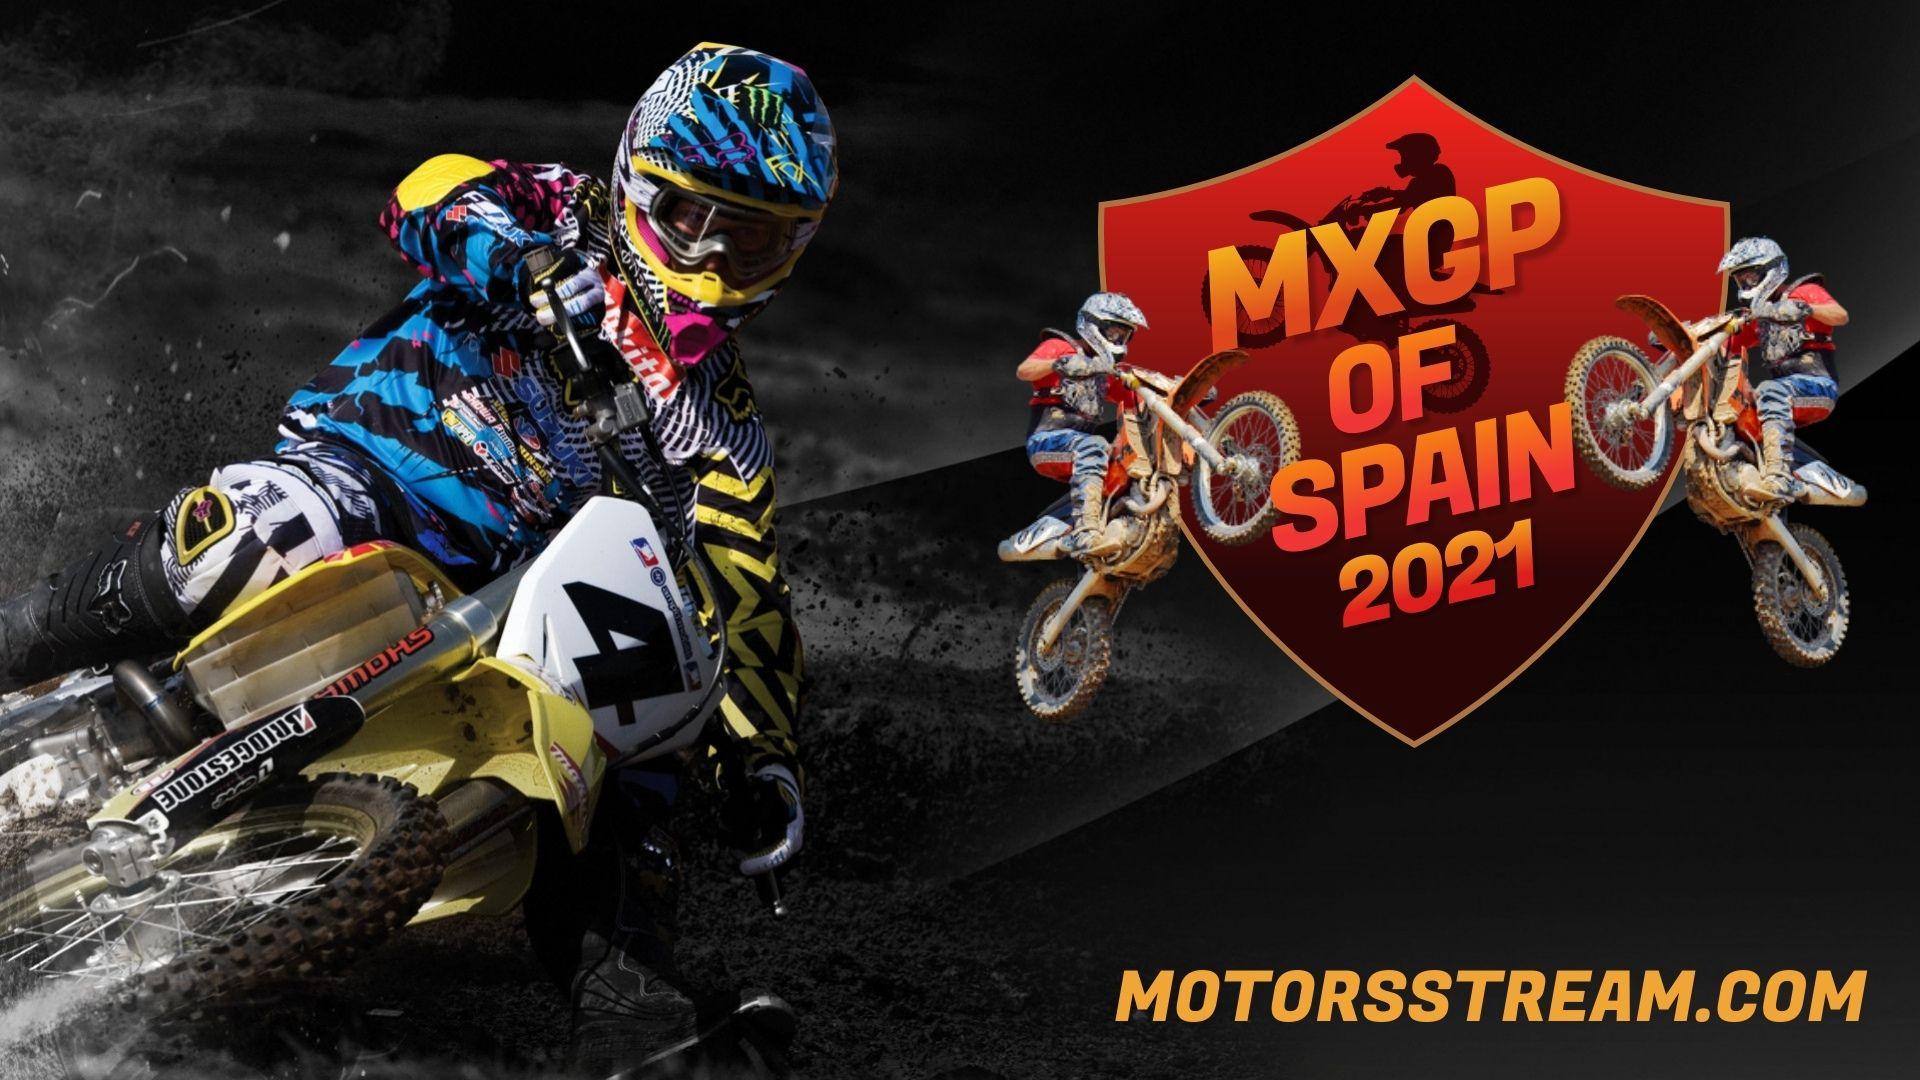 FIM Motocross WC Spain Live Stream 2021 | MXGP